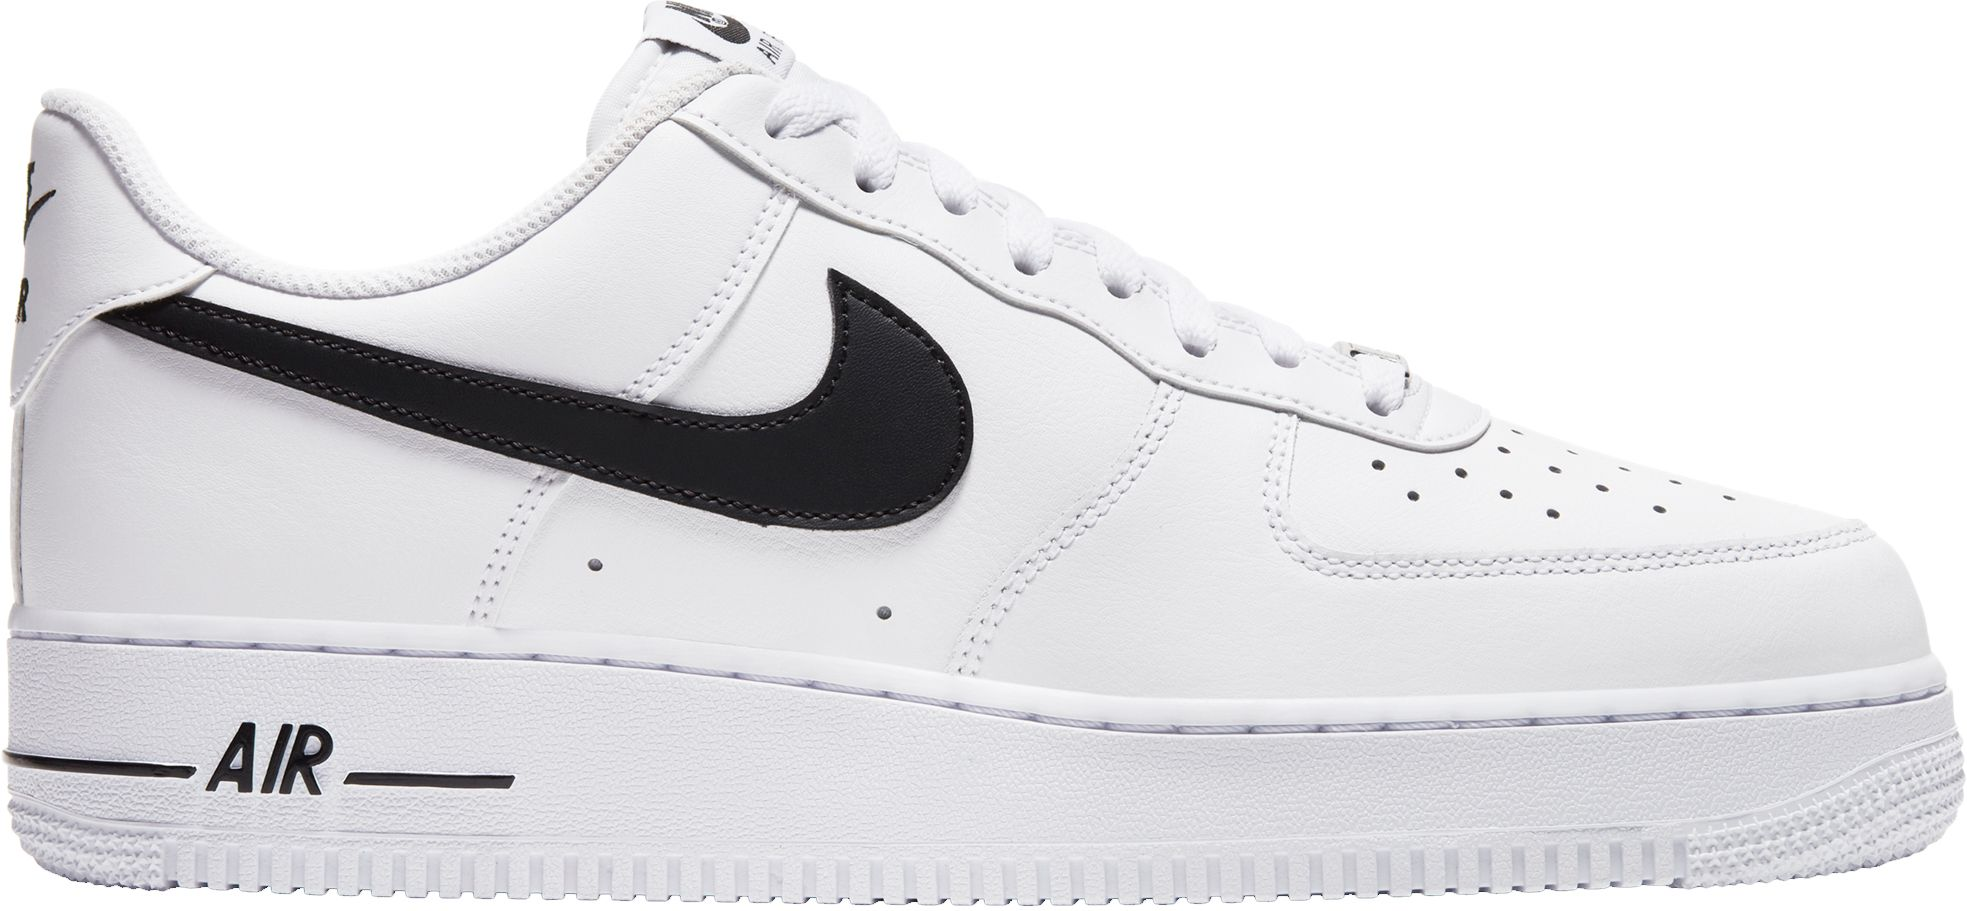 Nike Air Force 1 | Best Price Guarantee